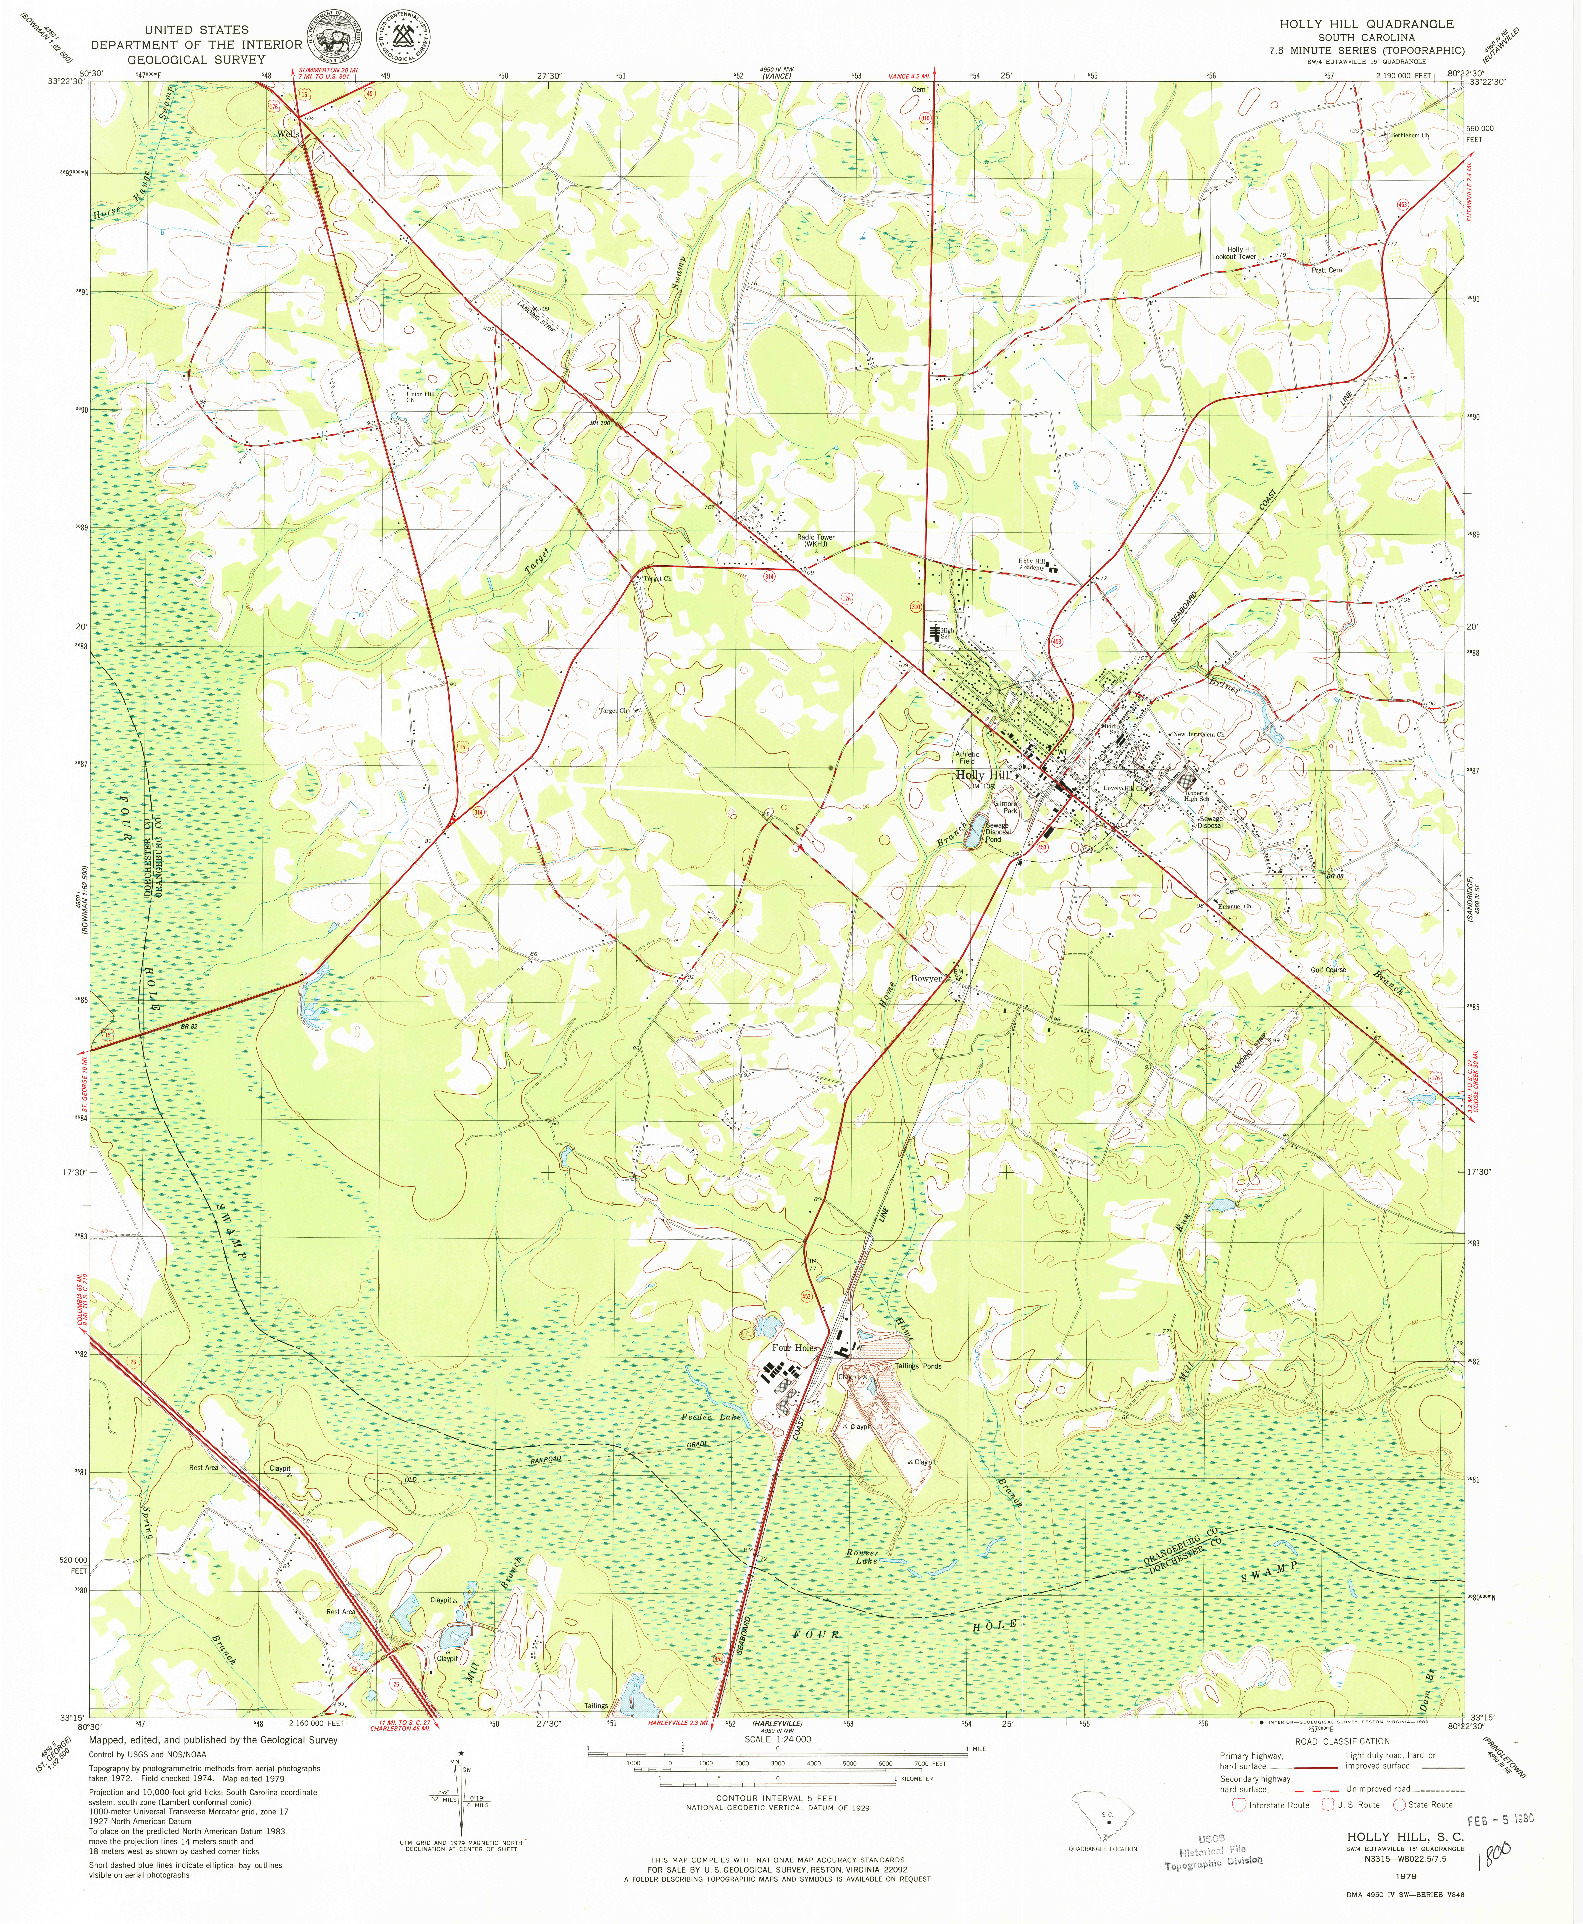 USGS 1:24000-SCALE QUADRANGLE FOR HOLLY HILL, SC 1979